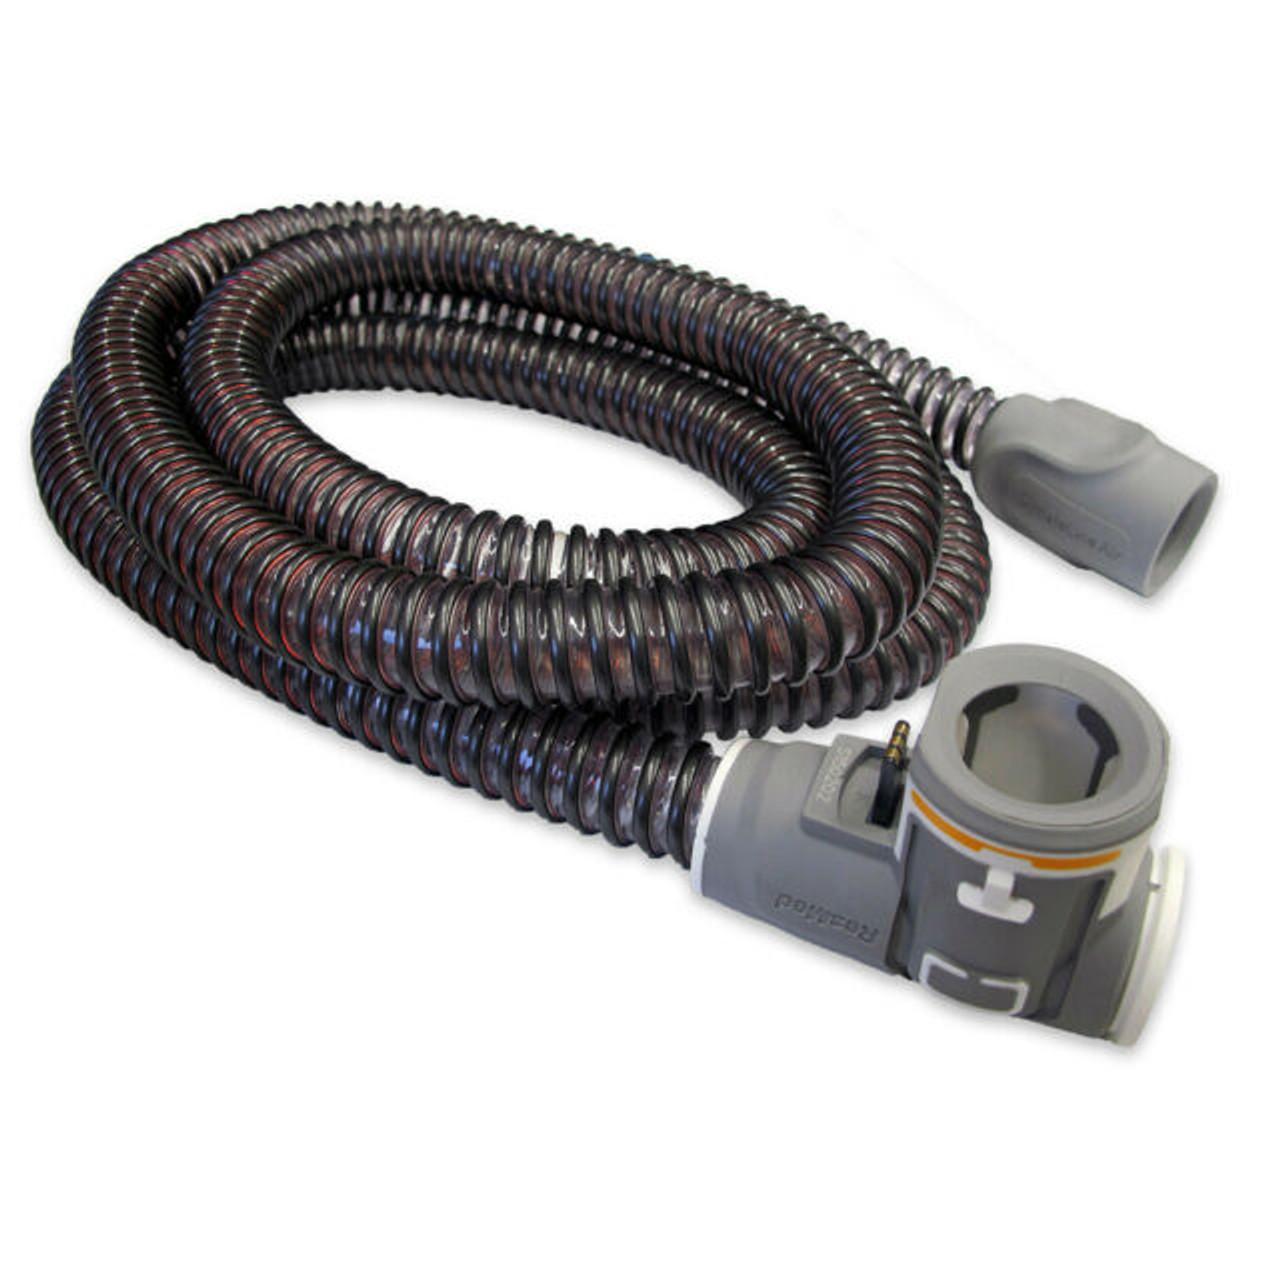 Resmed AirSense 10 ClimateLineAir Heated tube